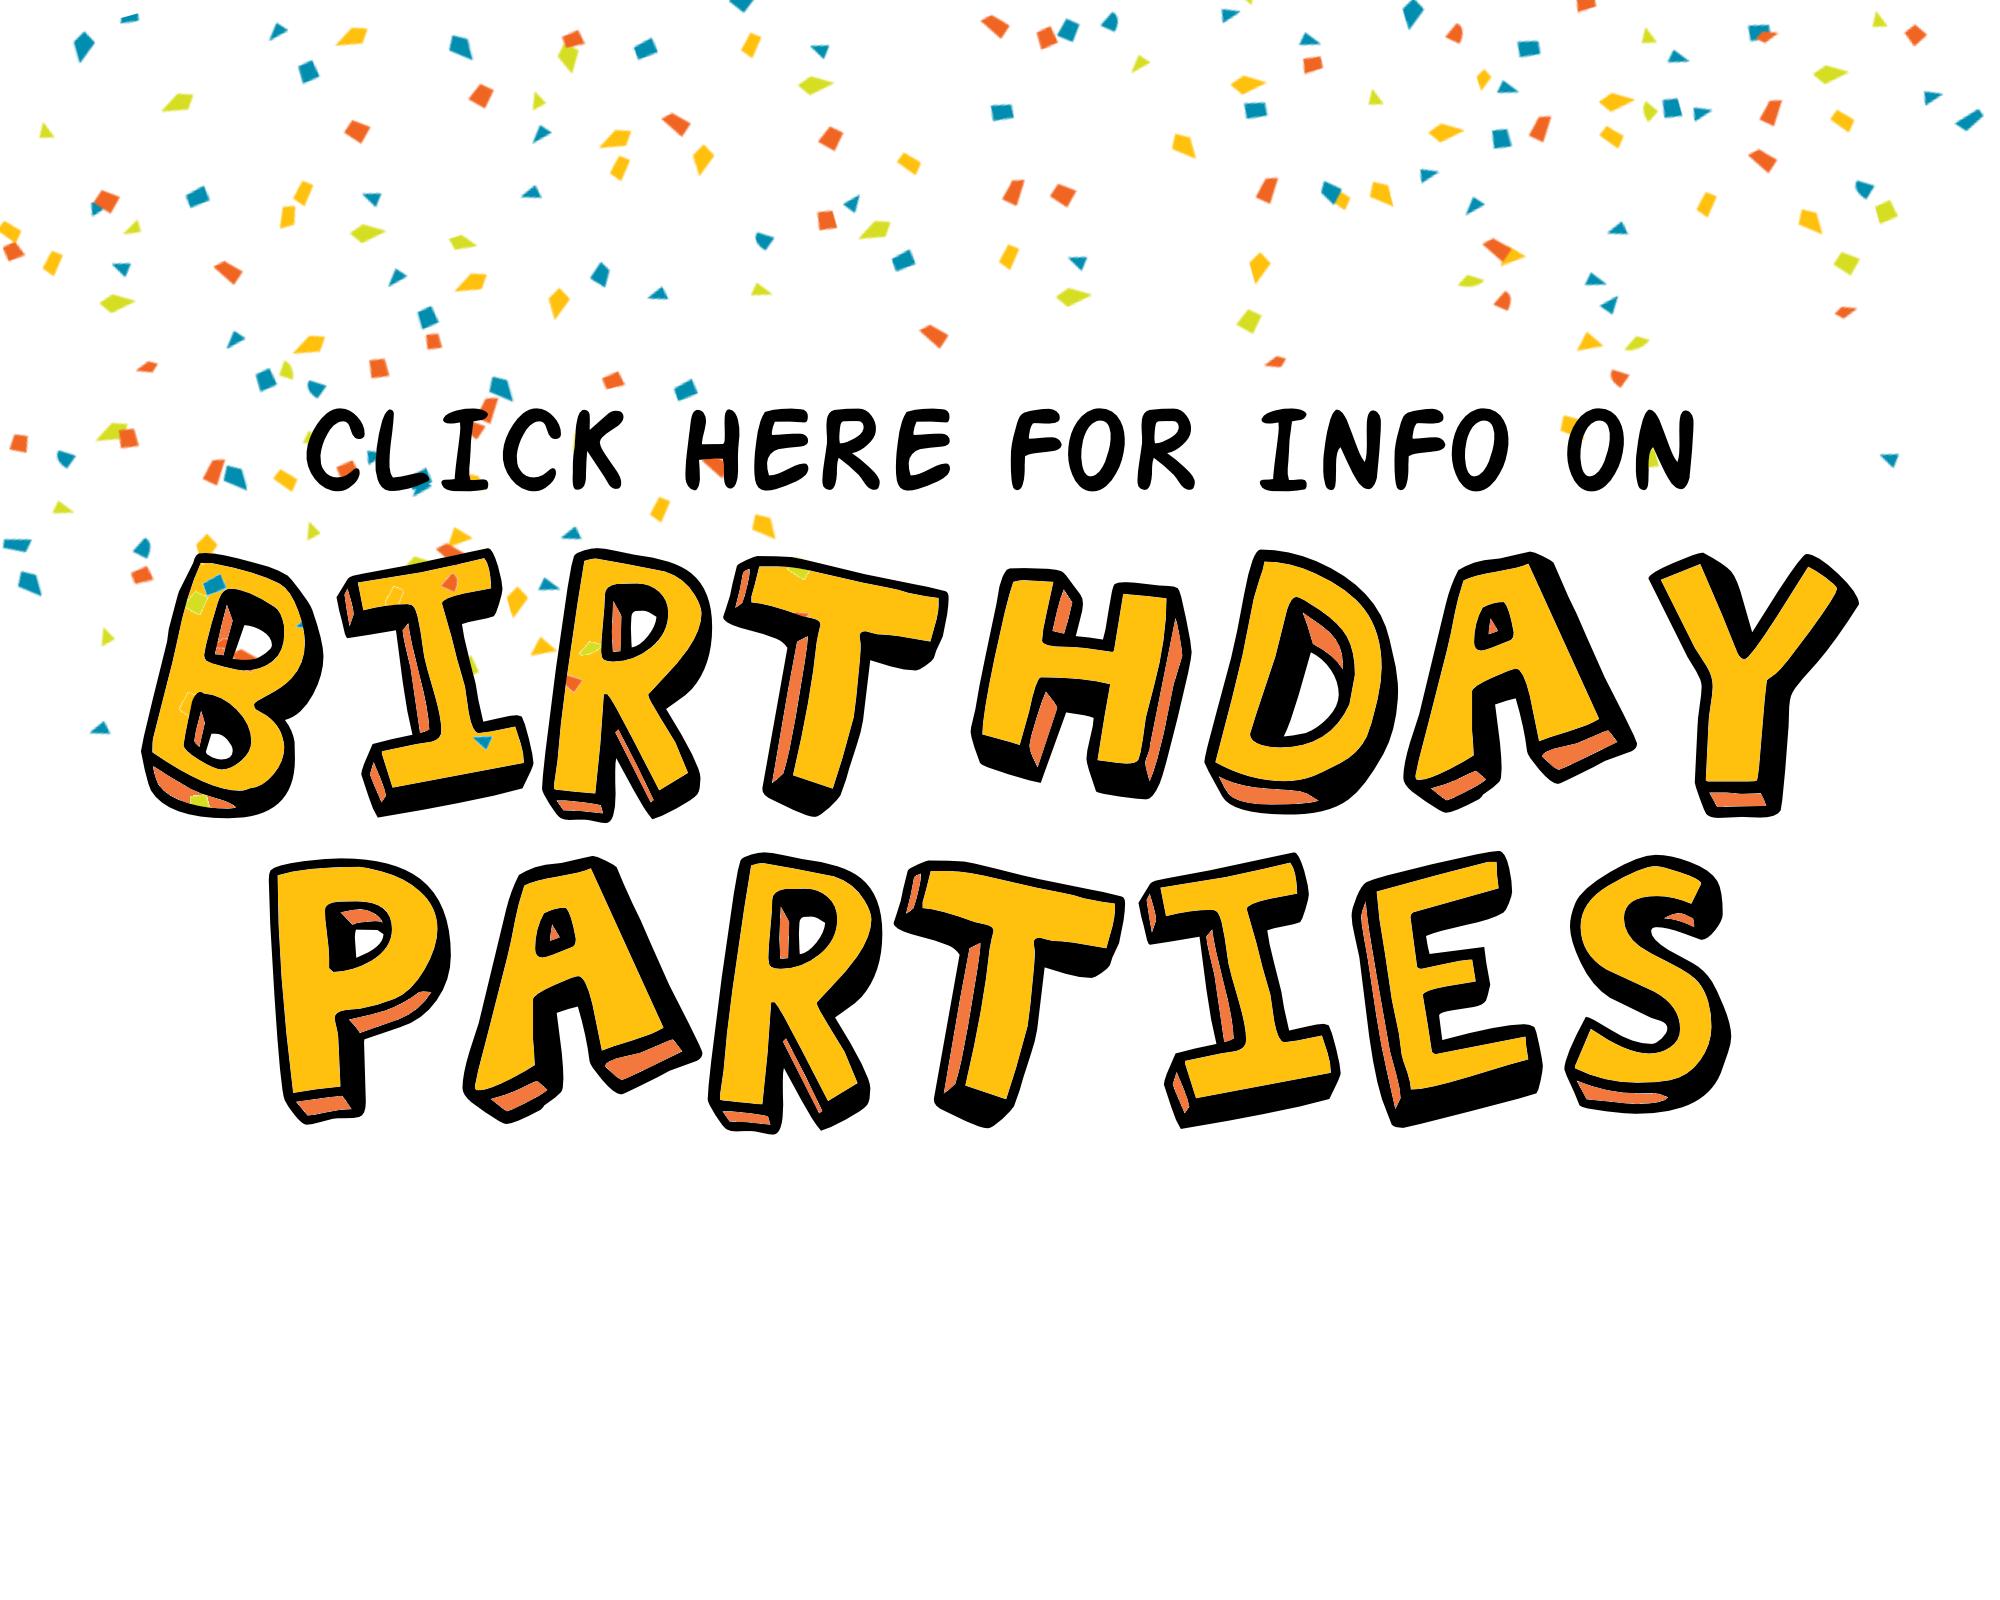 BIRTHDAY PARTIES WEBSITE